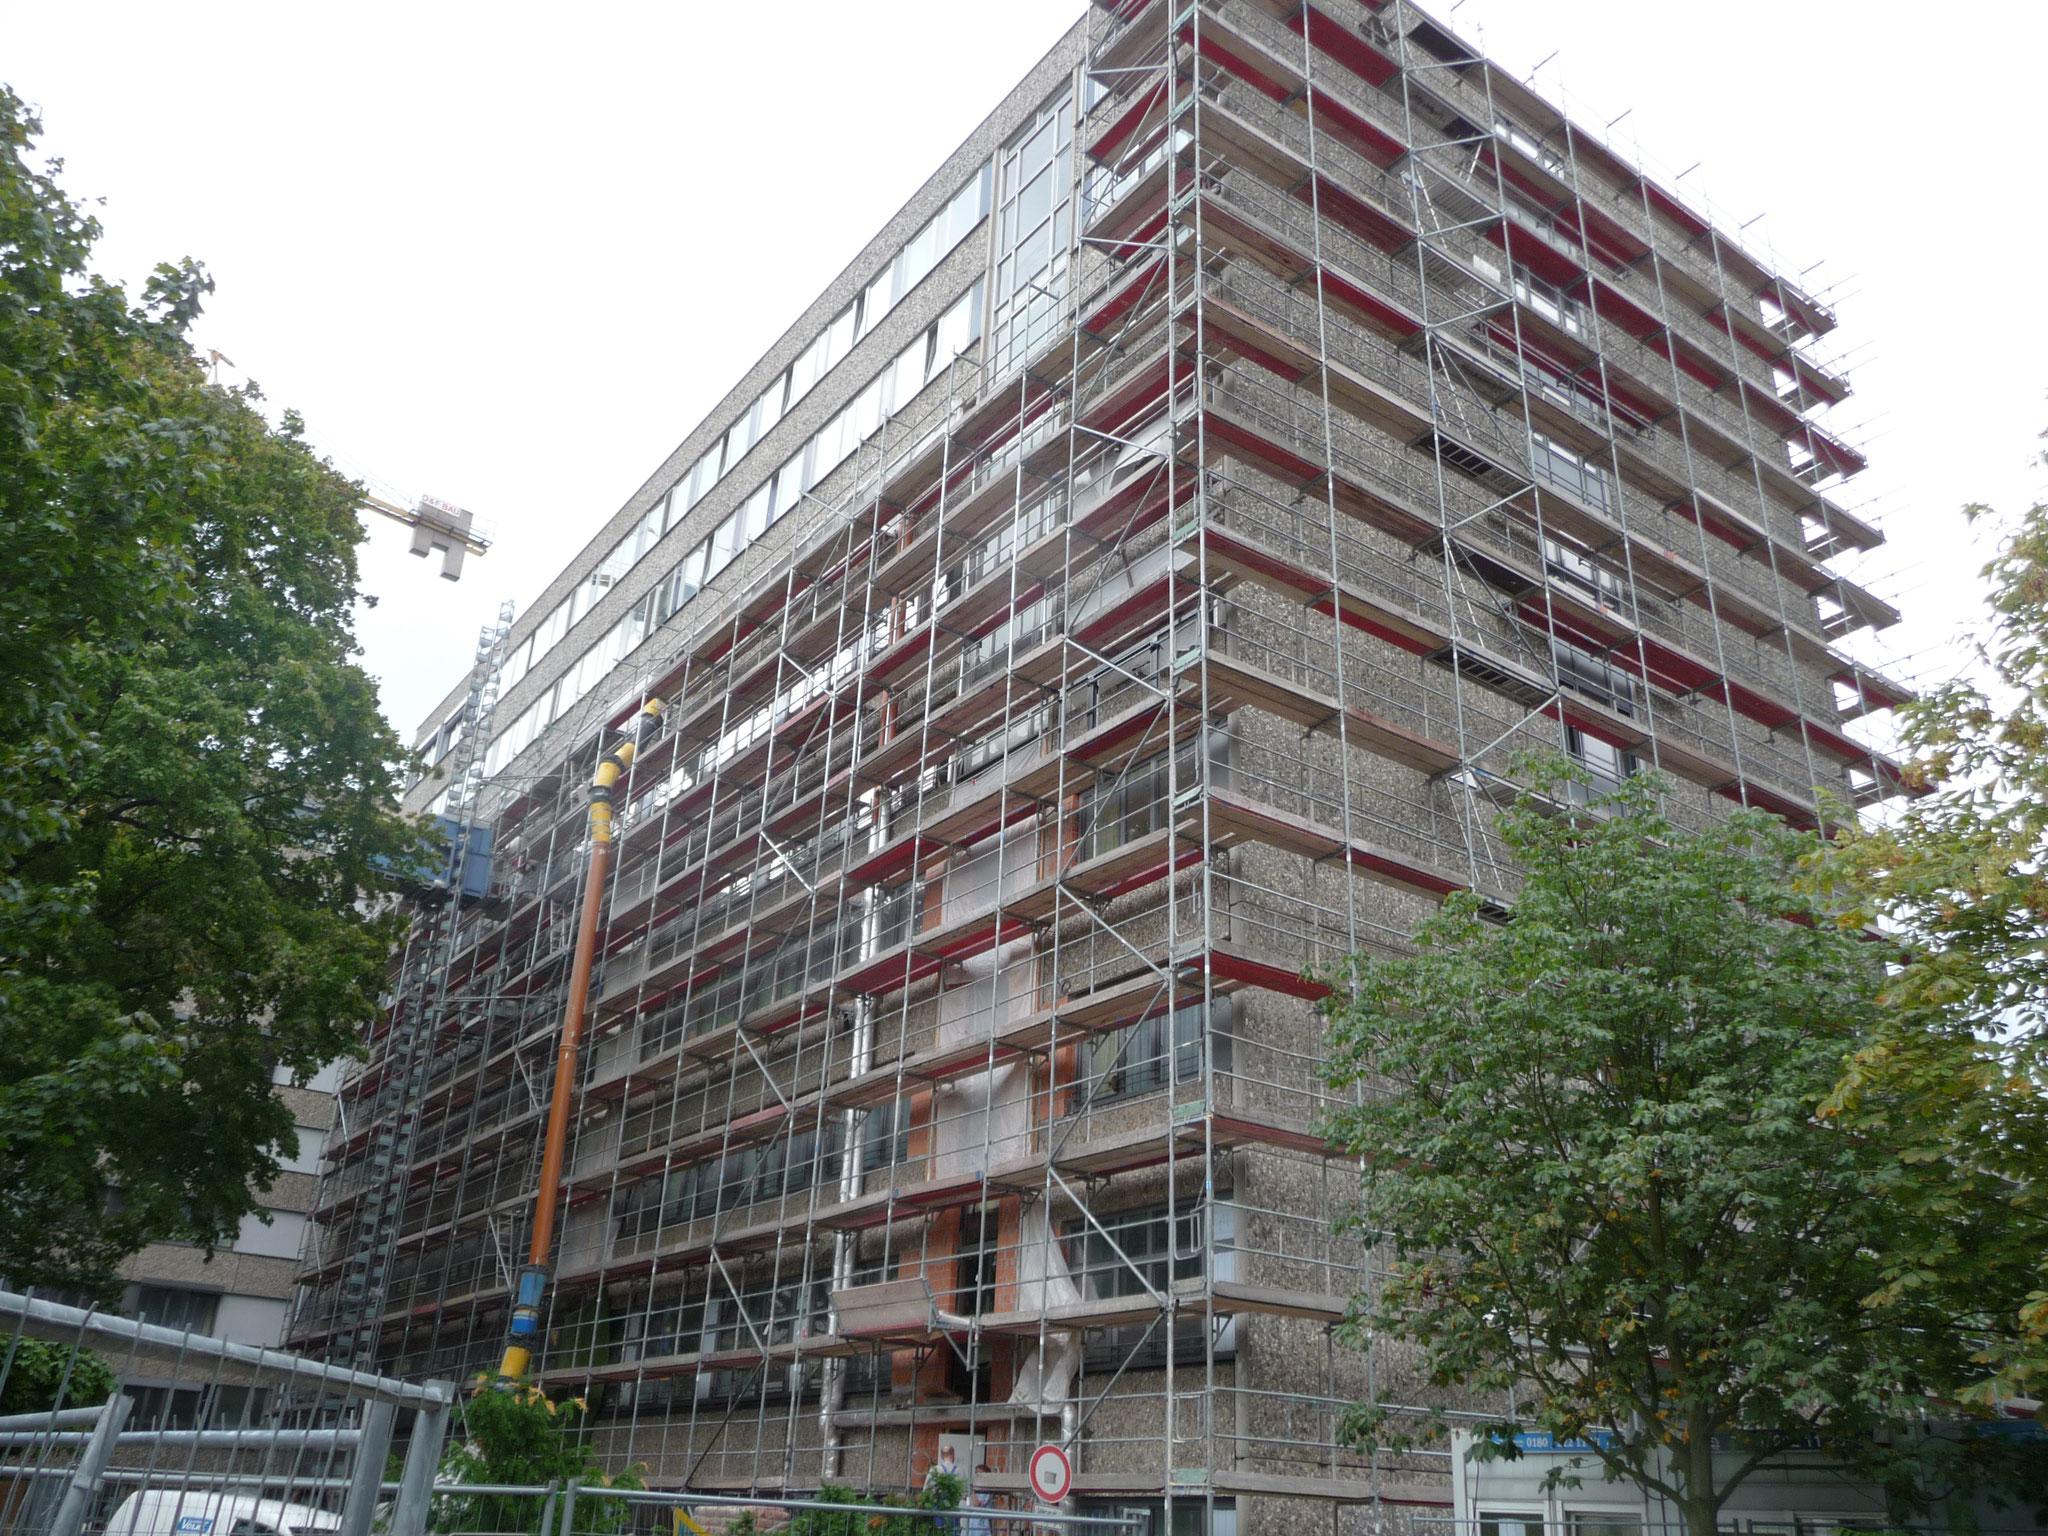 Ernst von Bergmann Klinikum Potsdam ca. 2600m² Fassadengerüst Lastklasse 3